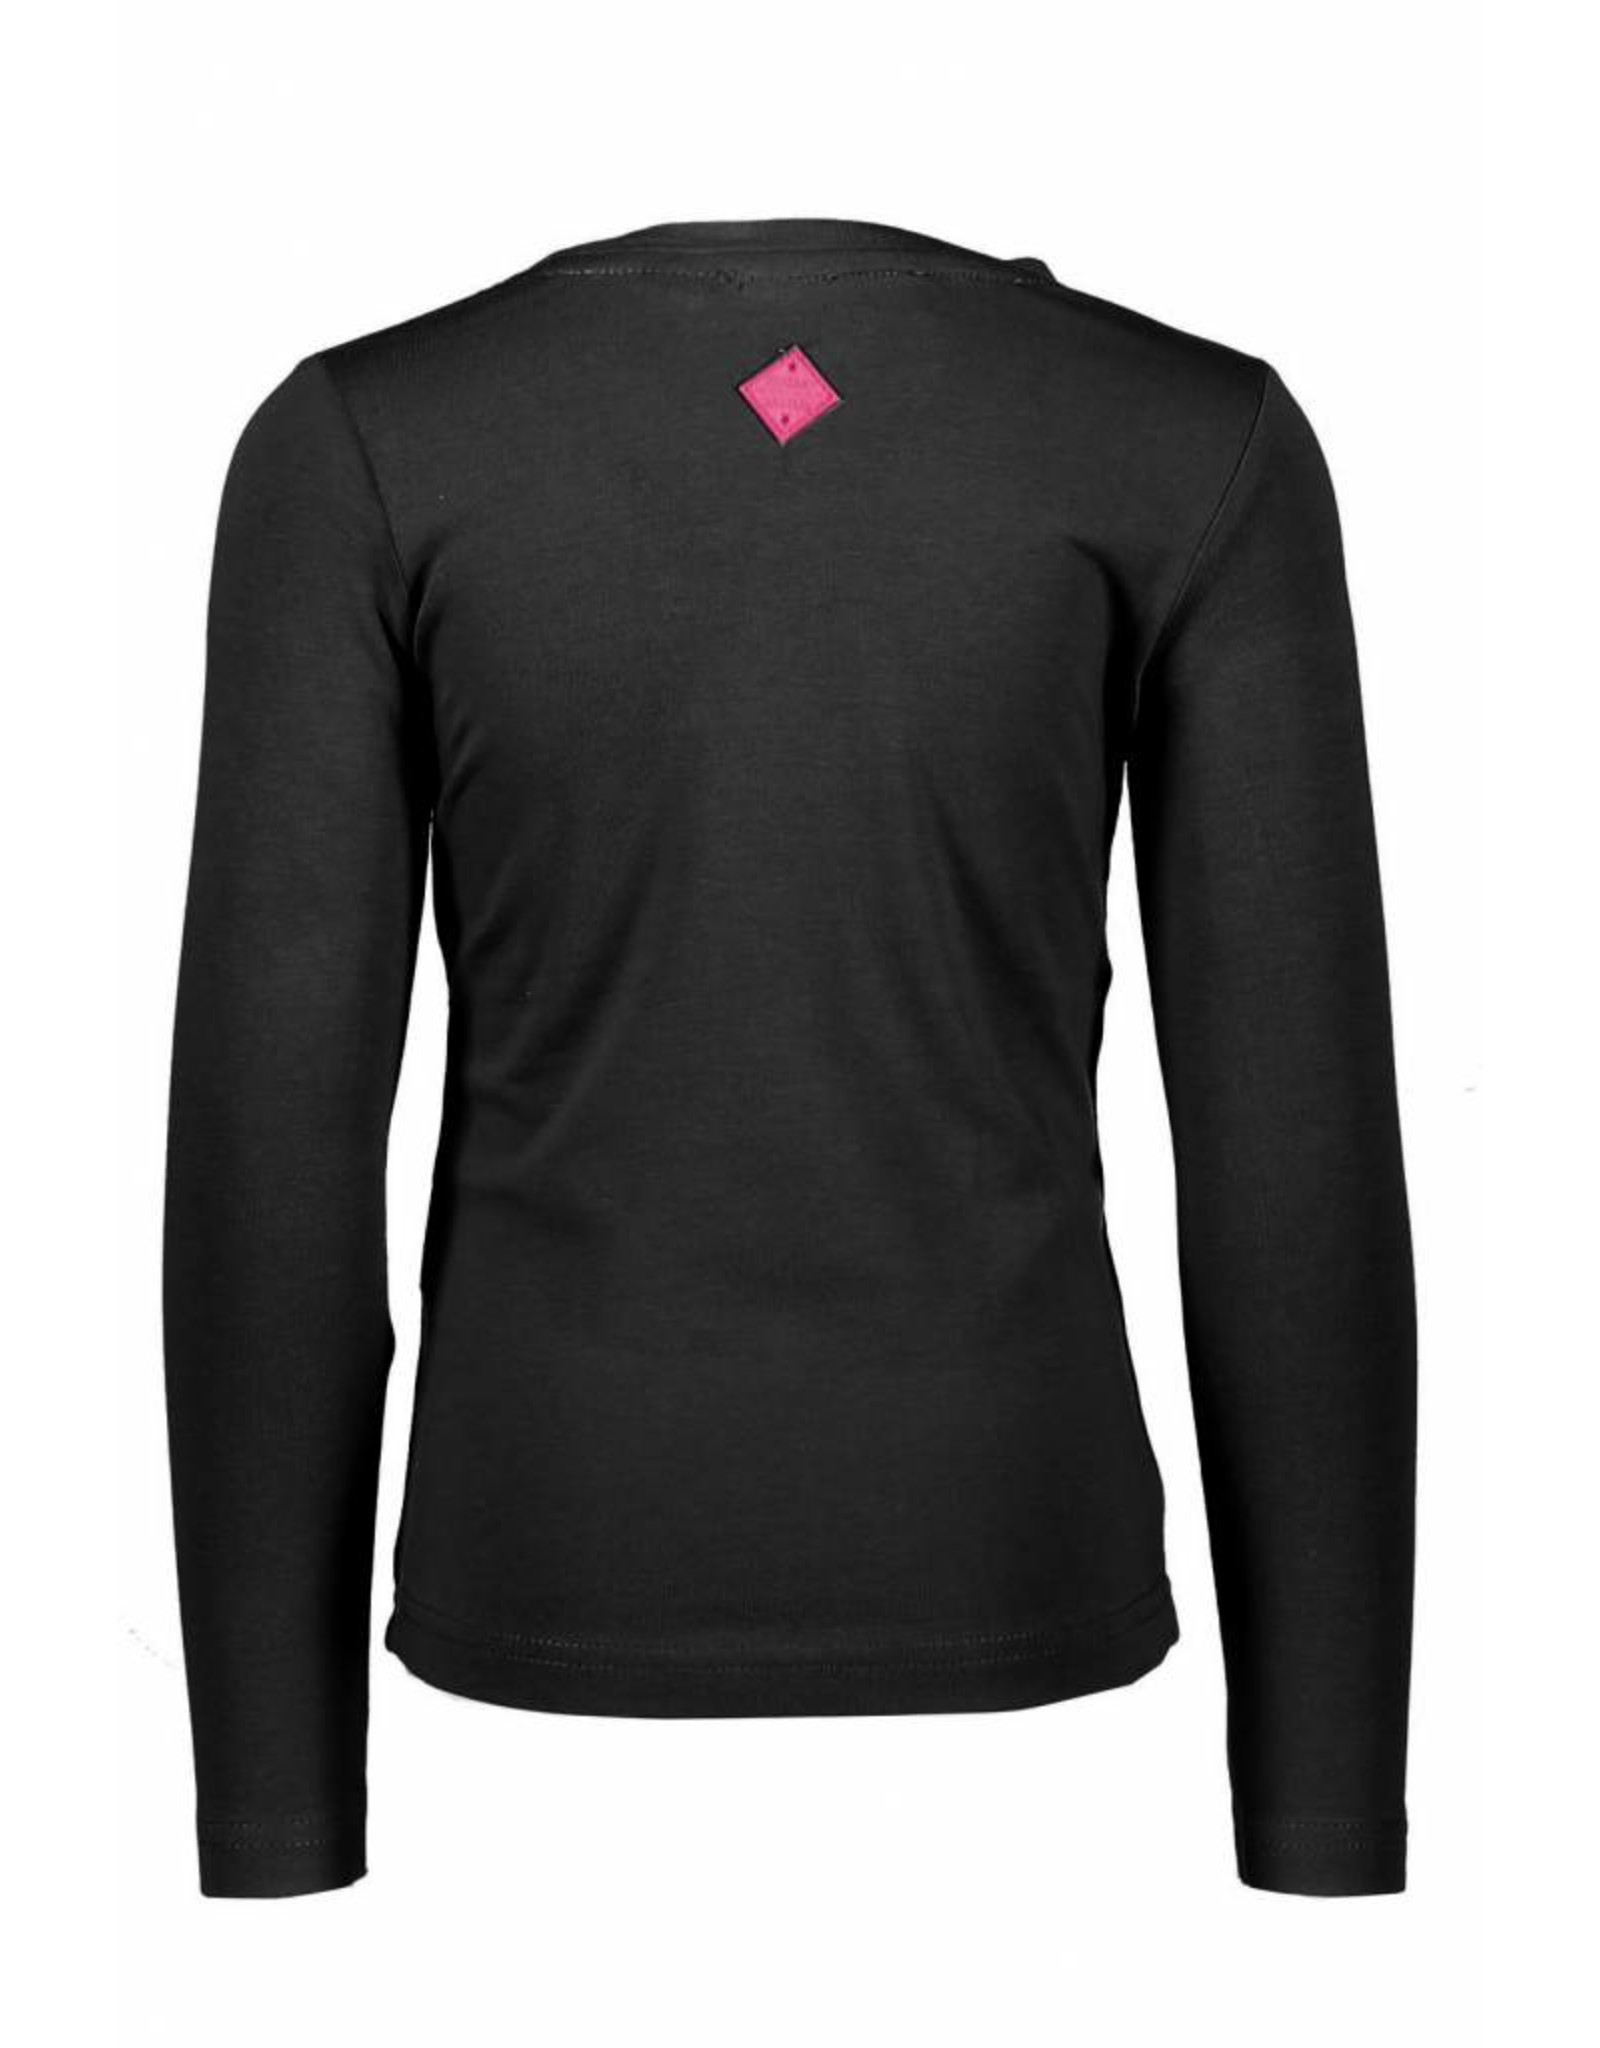 B.Nosy B.Nosy meisjes shirt Black